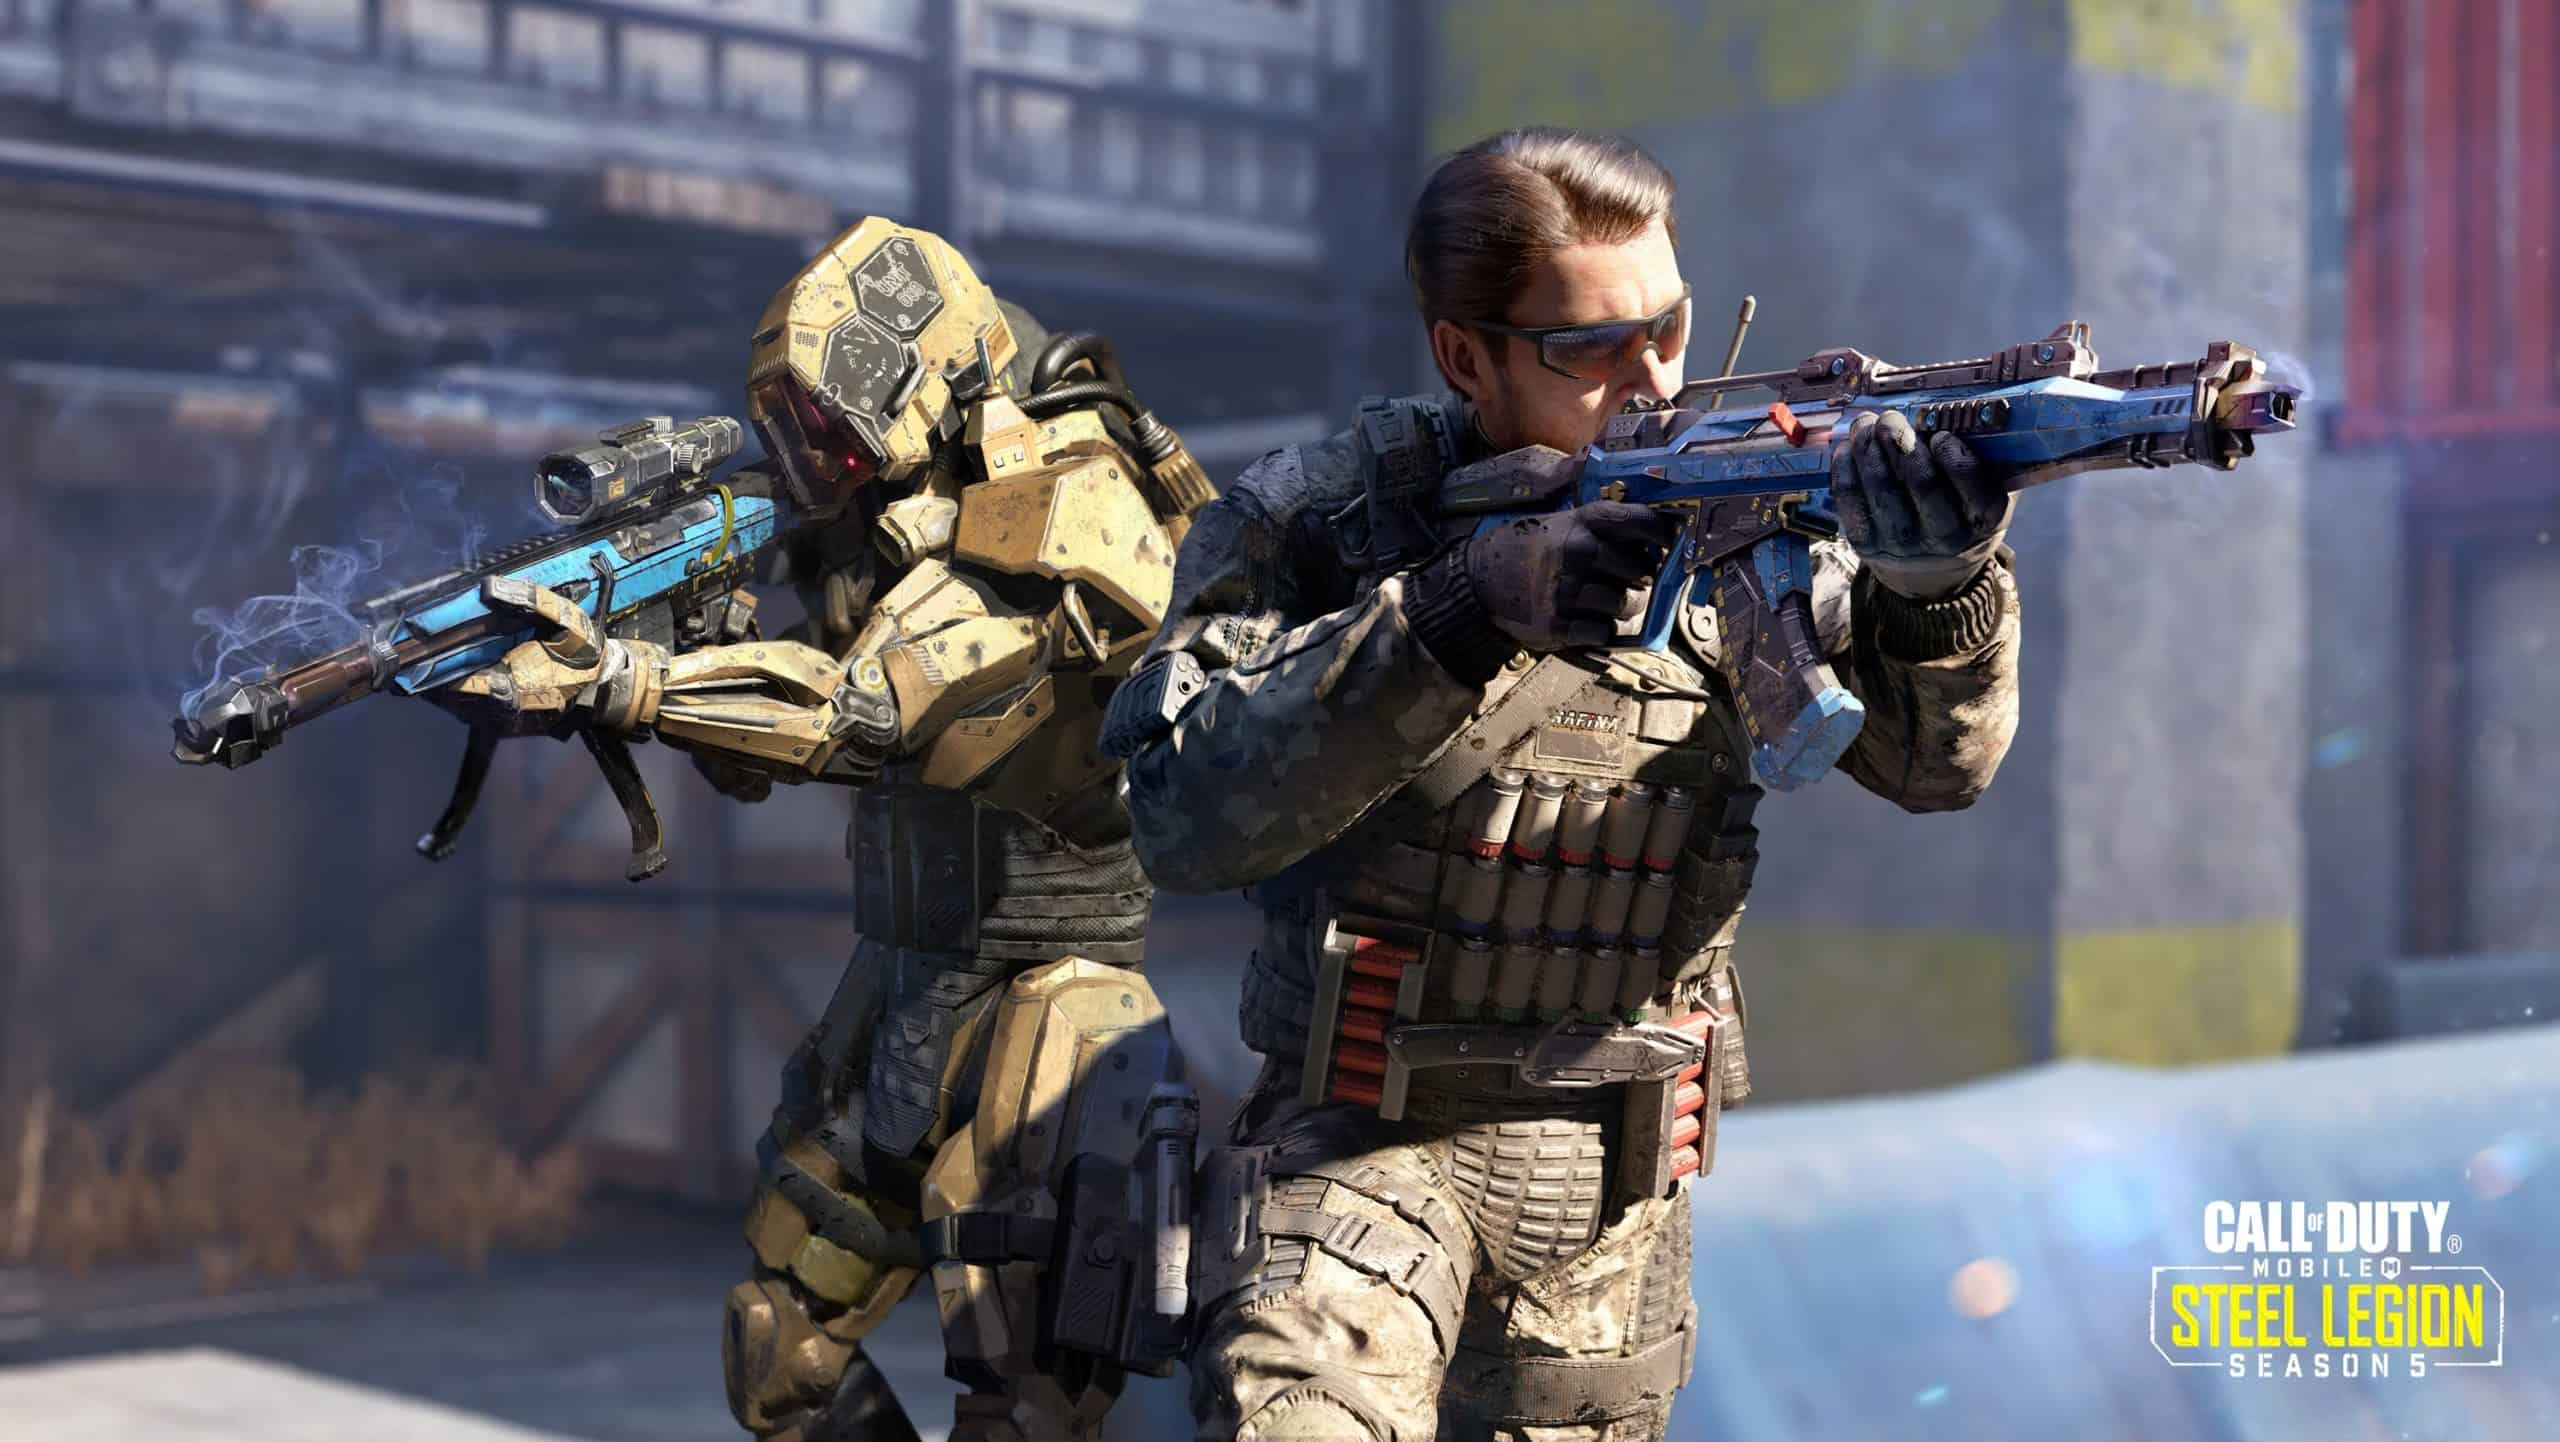 Call Of Duty Mobile Season 5 Brings Robots Tons Of Cool Loot